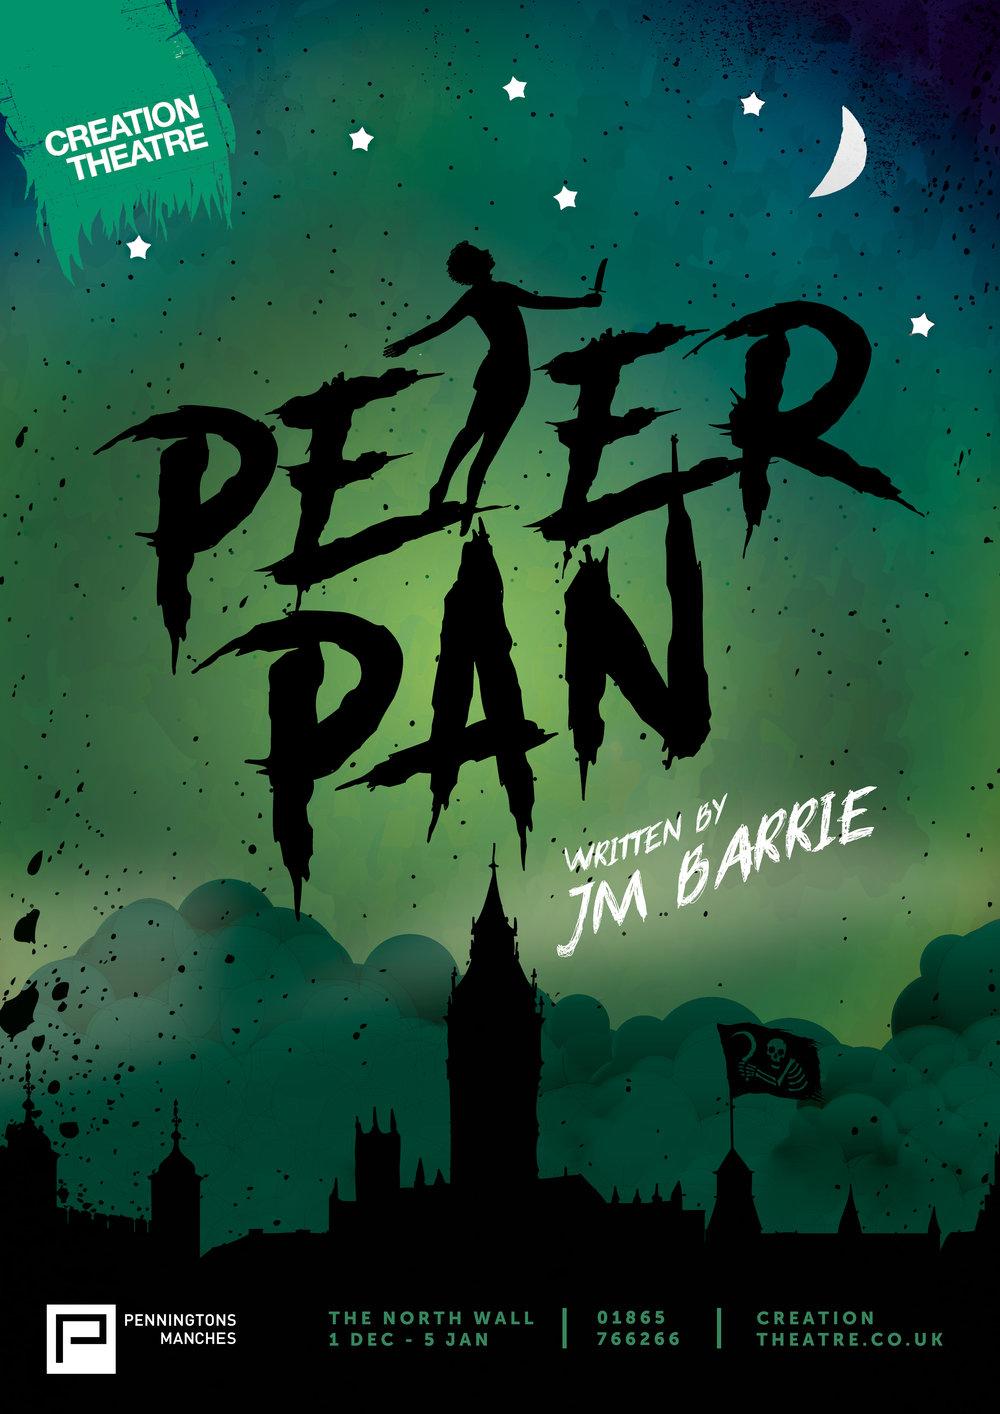 Creation+Peter+Pan+LW+v004.jpg